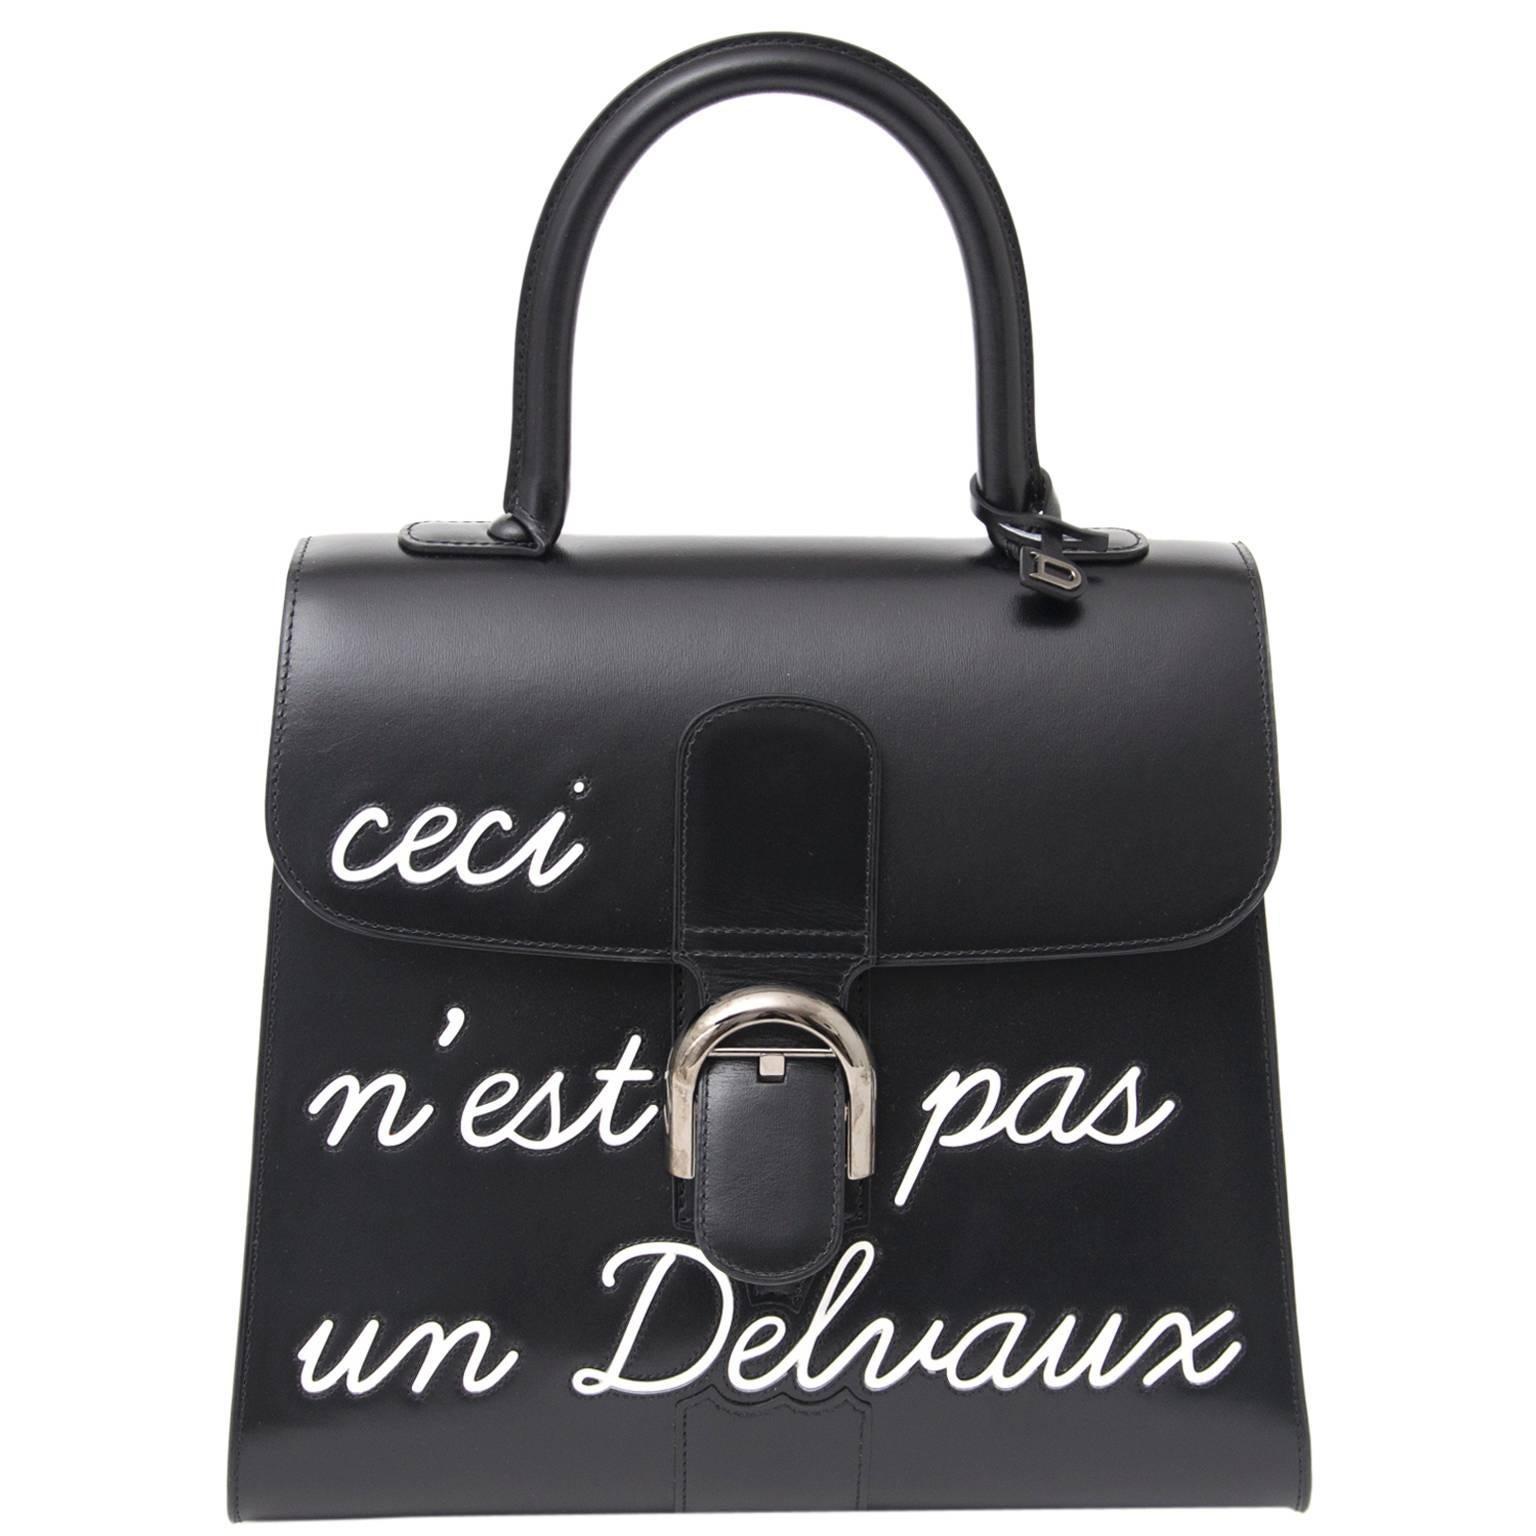 8cc4779193f6 Labellov Handbags and Purses - 1stdibs - Page 8